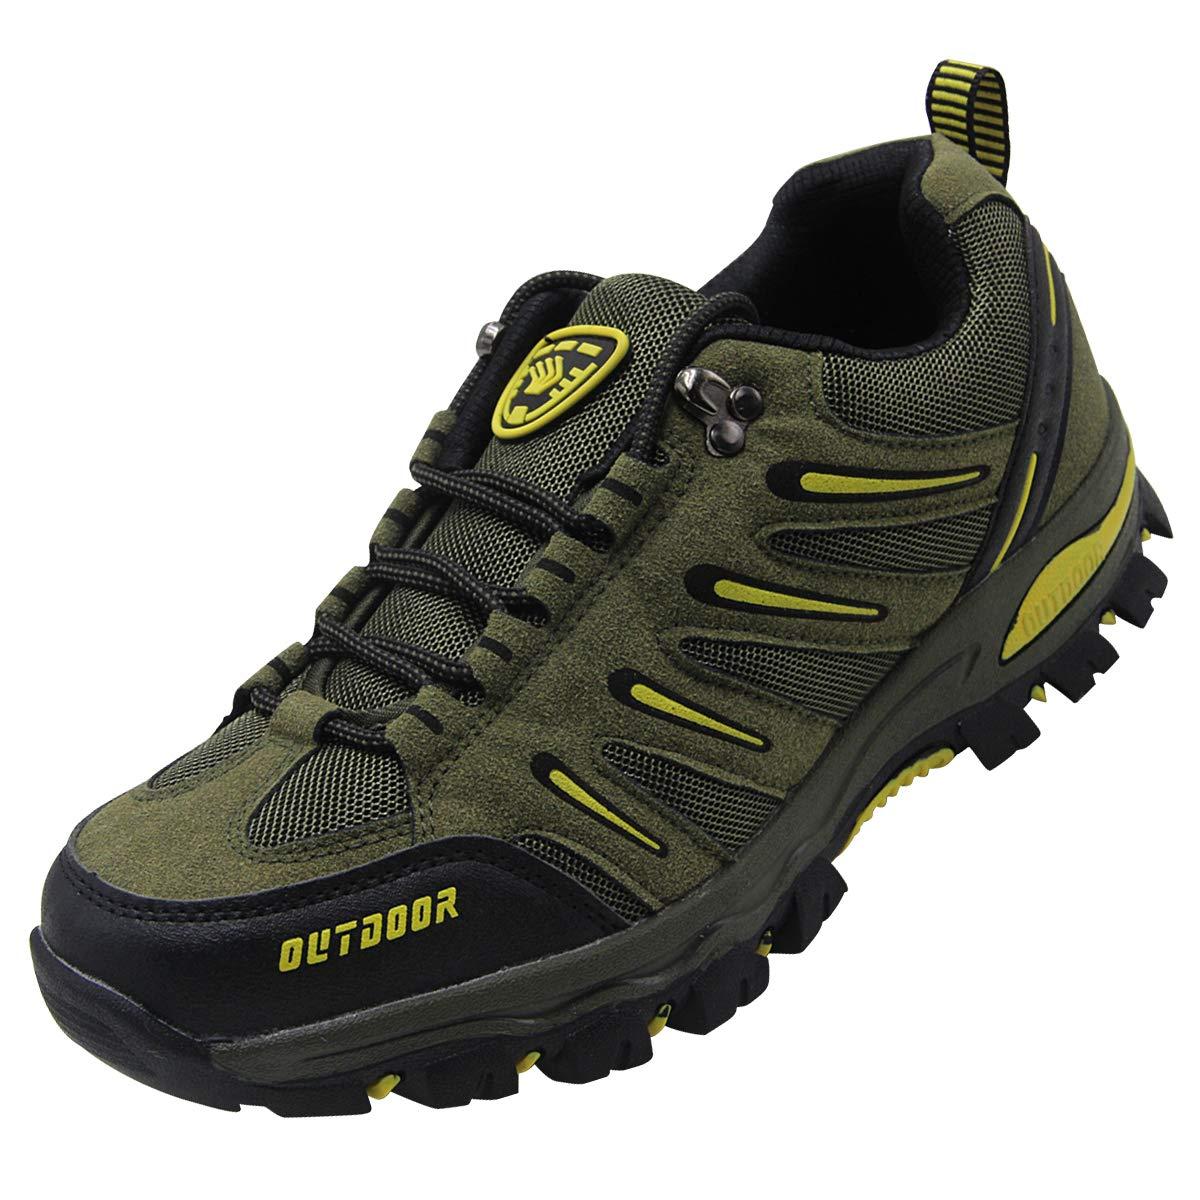 BomKinta Men\'s Hiking Shoes Anti-Slip Lightweight Breathable Quick-Dry Trekking Shoes for Men K999-2